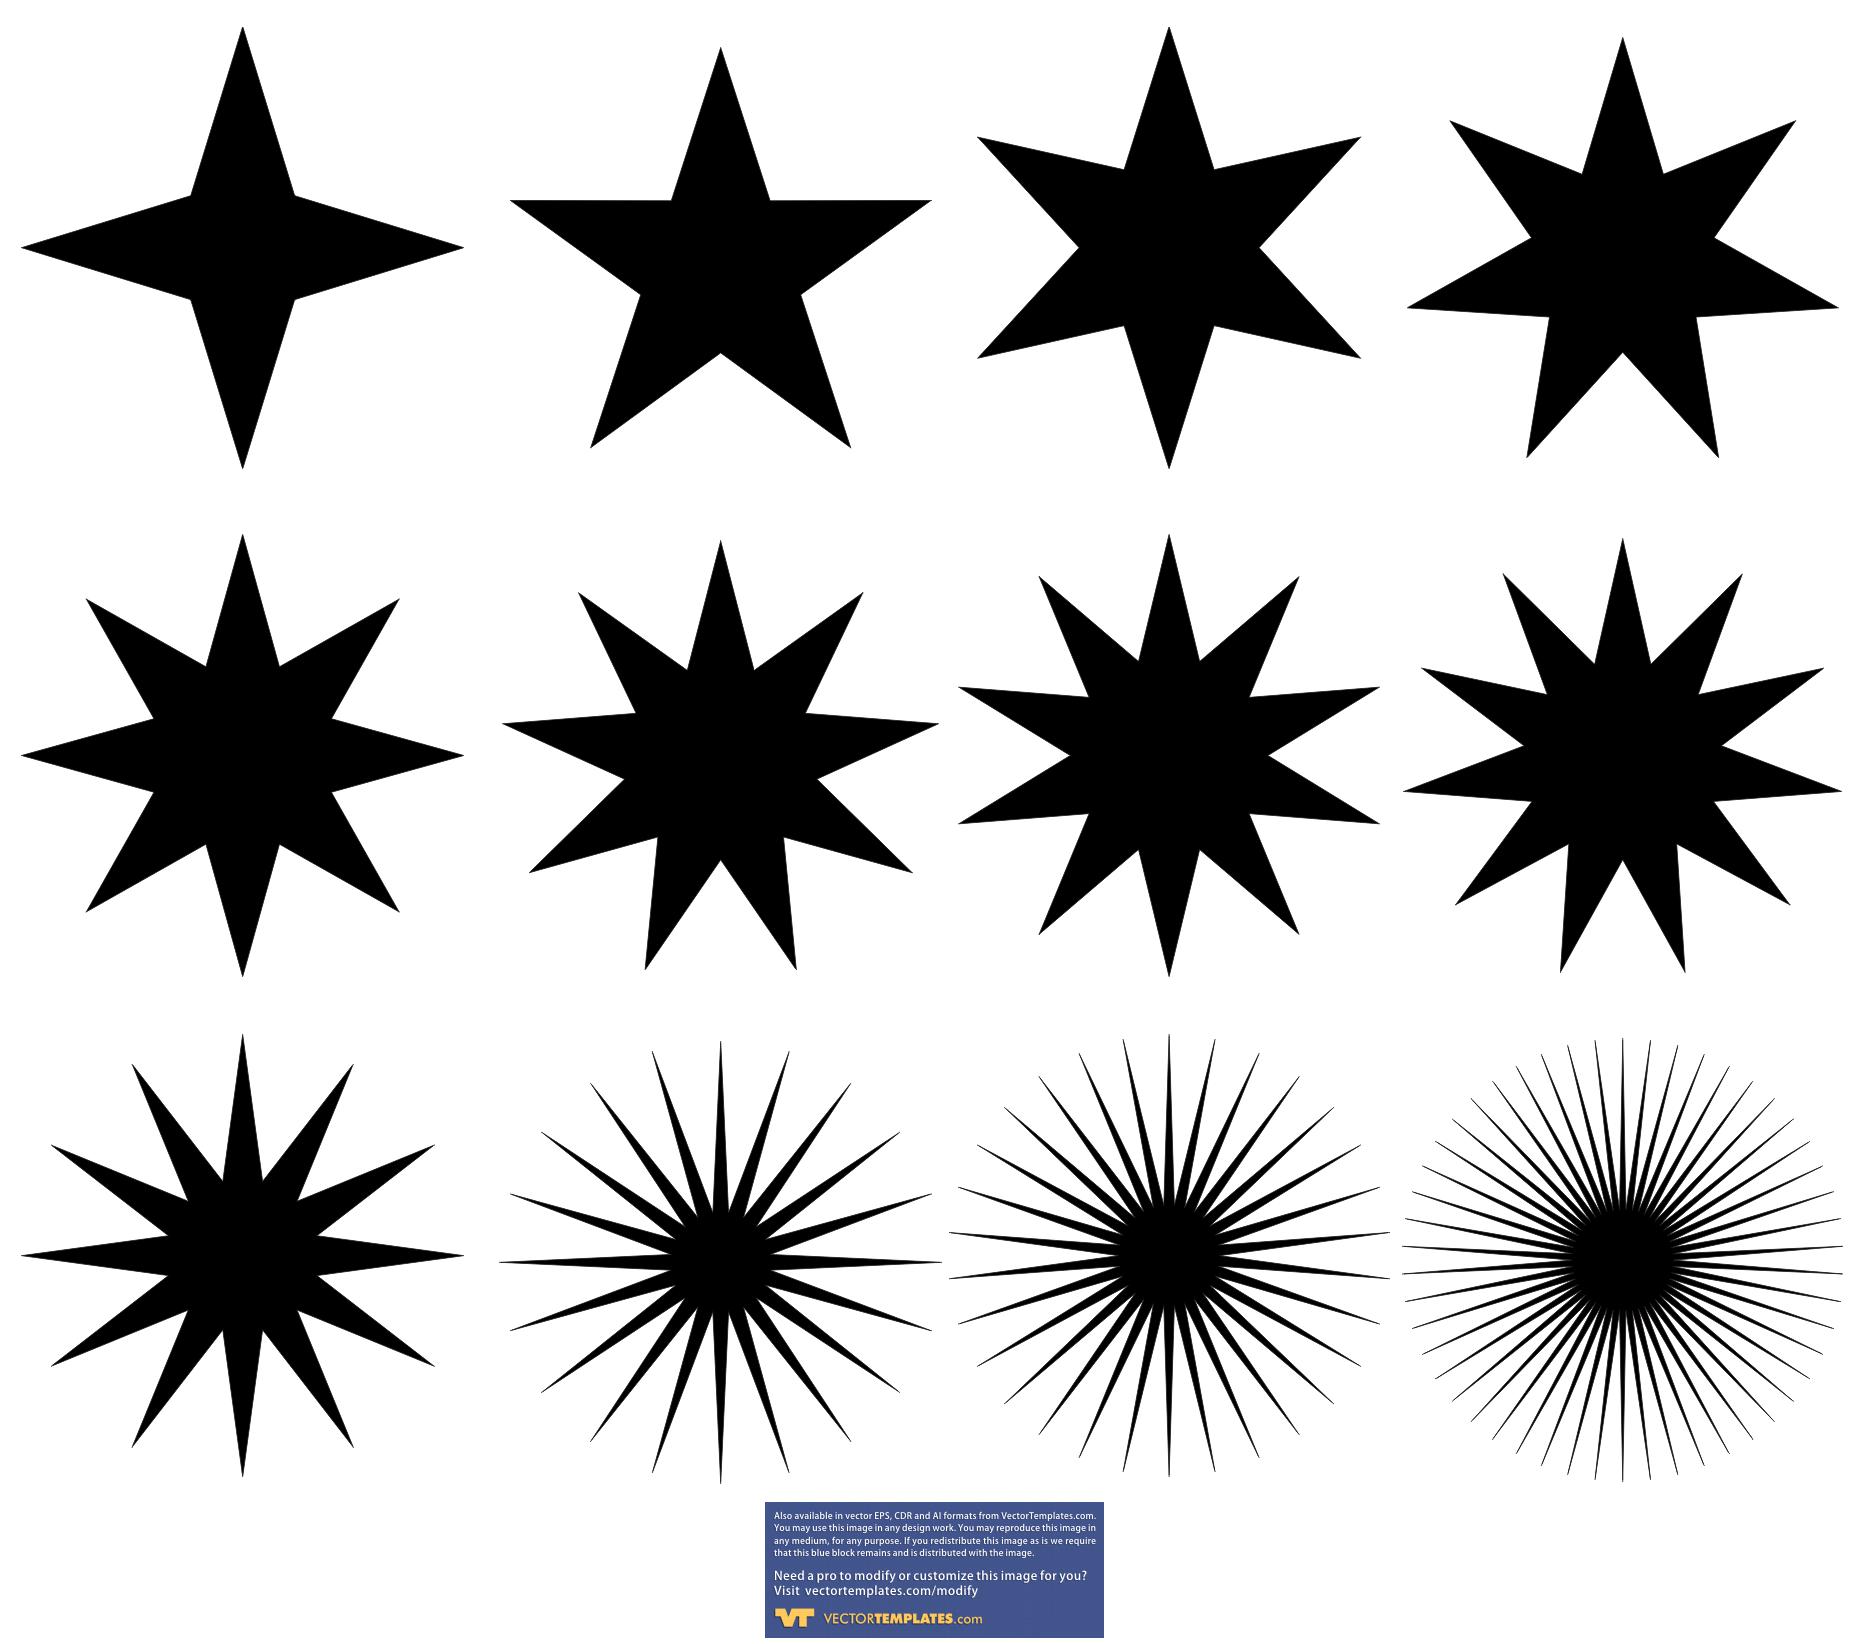 Stars Images Of Stars Star Shapes Star Shape Design Craft Star Designs